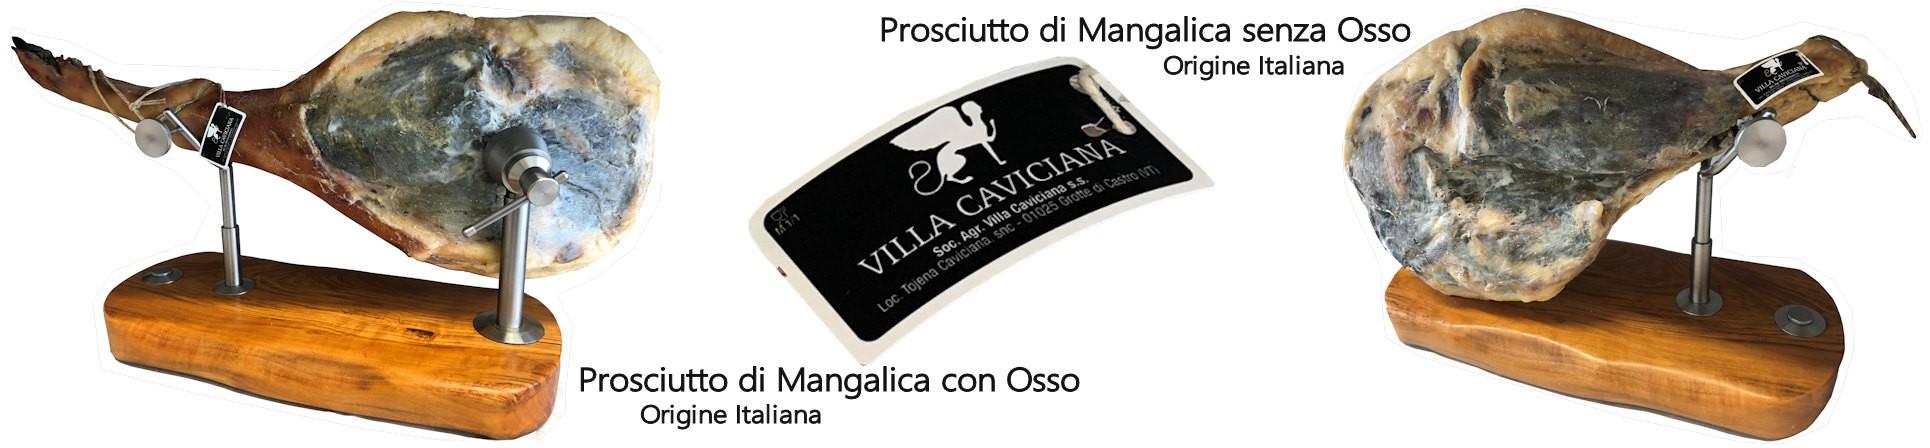 Grandi Salumi di Mangalica vendita online - Salumificio Villa Caviciana